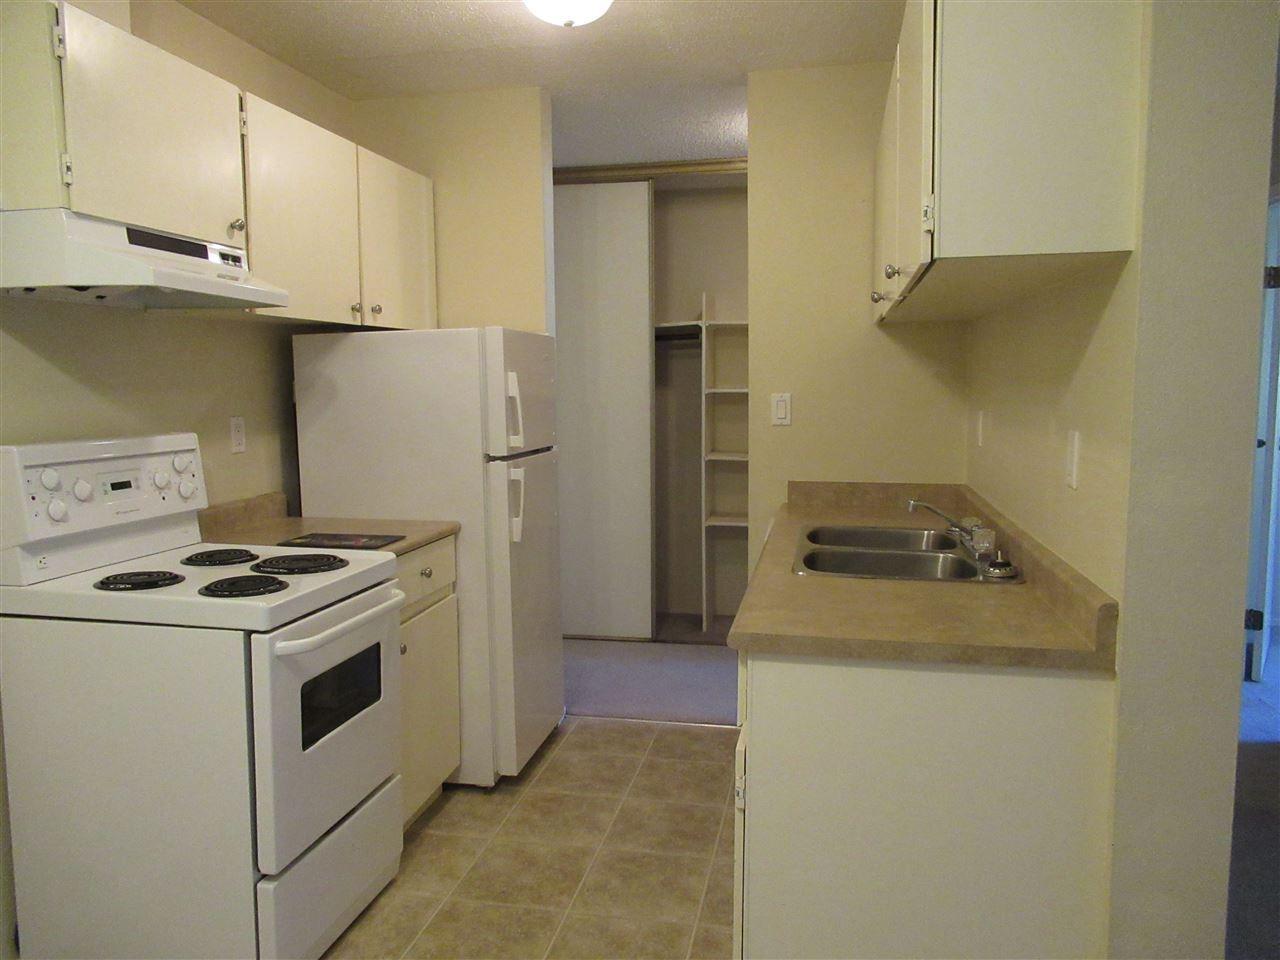 Photo 4: Photos: 103 280 N BROADWAY Avenue in Williams Lake: Williams Lake - City Condo for sale (Williams Lake (Zone 27))  : MLS®# R2455569